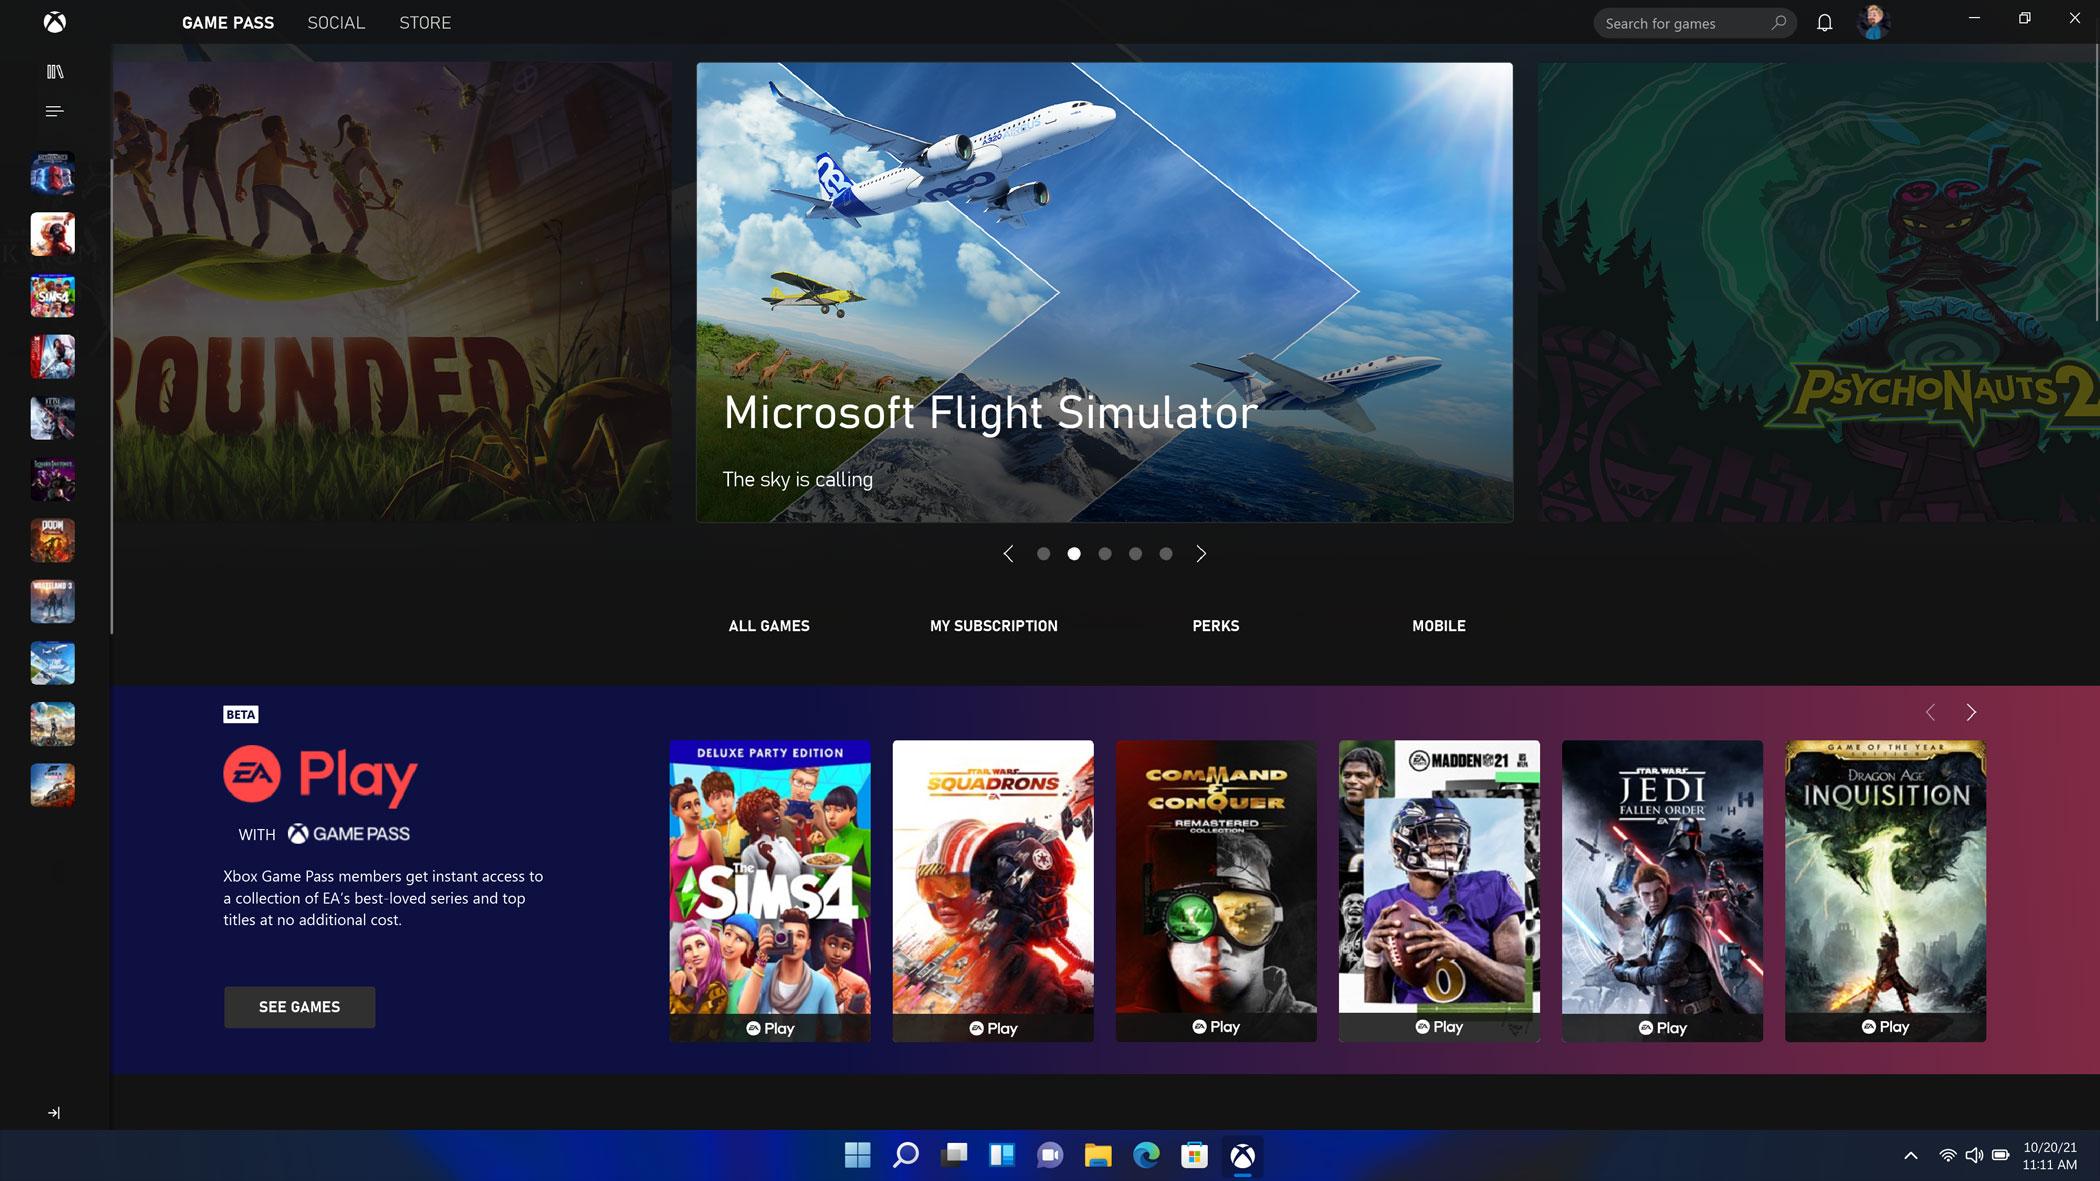 Windows 11 - Xbox Game Pass Screen